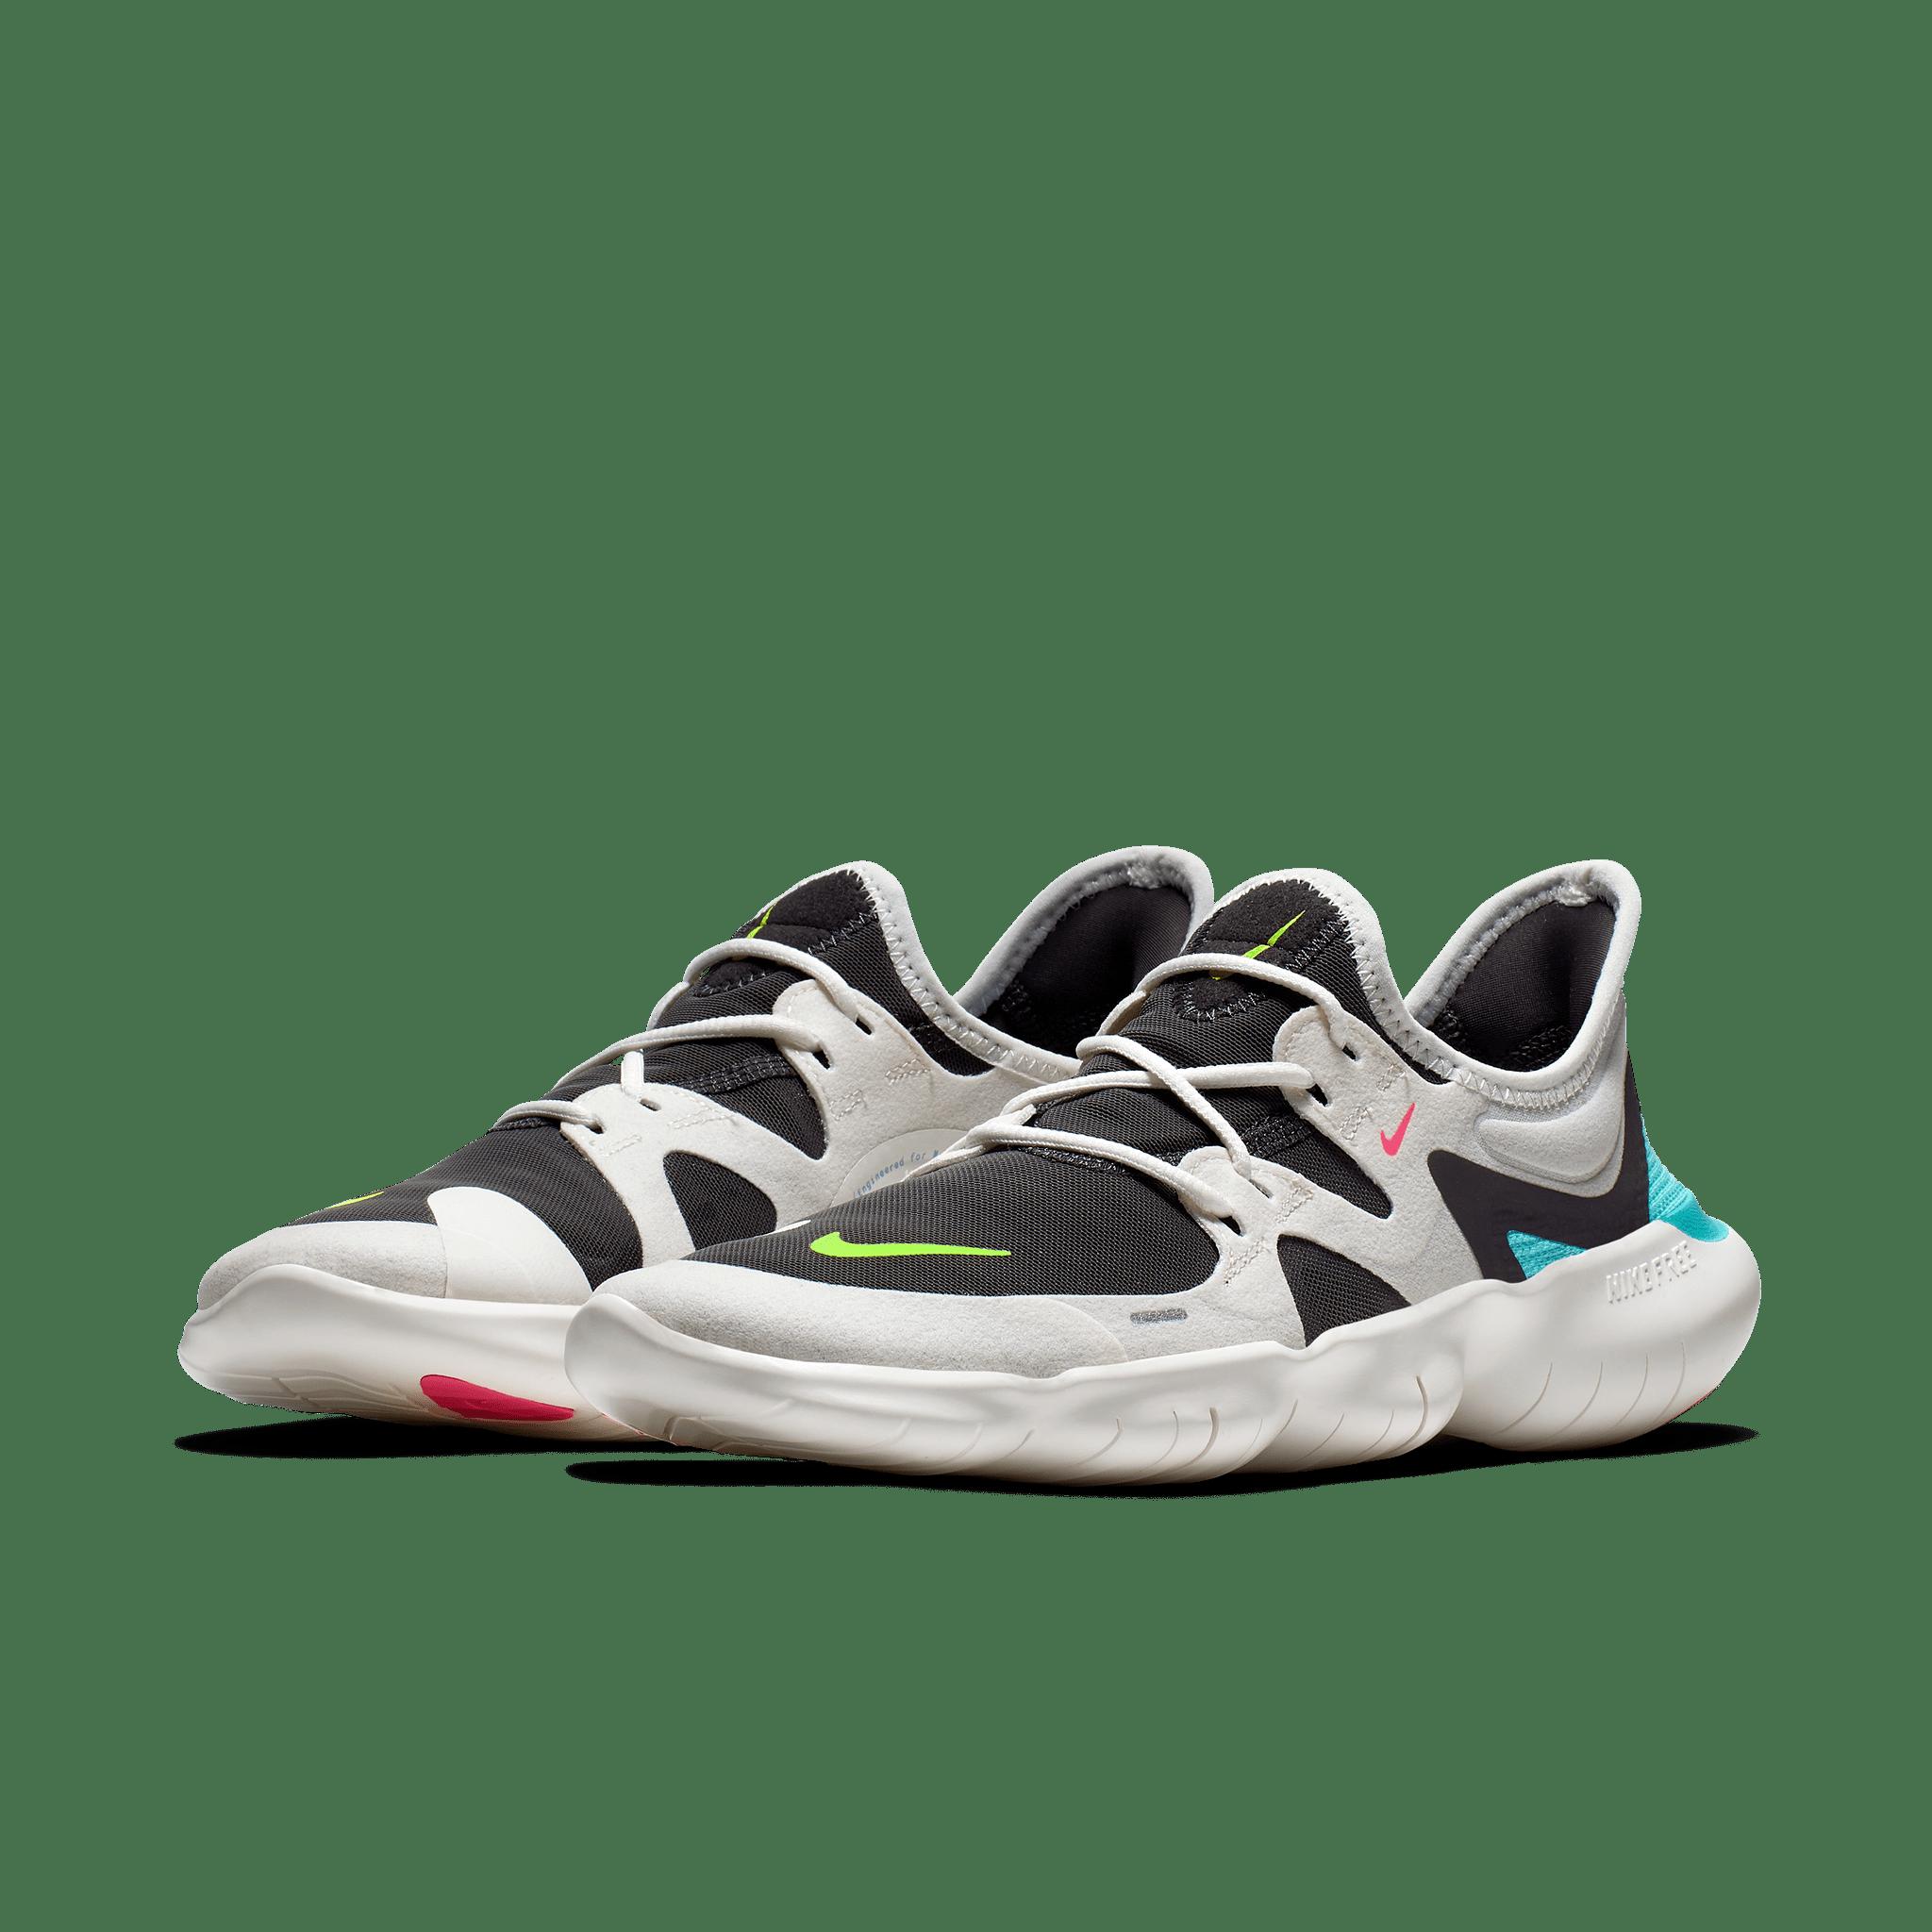 Nike Free 5.0 Running Shoe 2019 | POPSUGAR Fitness Australia